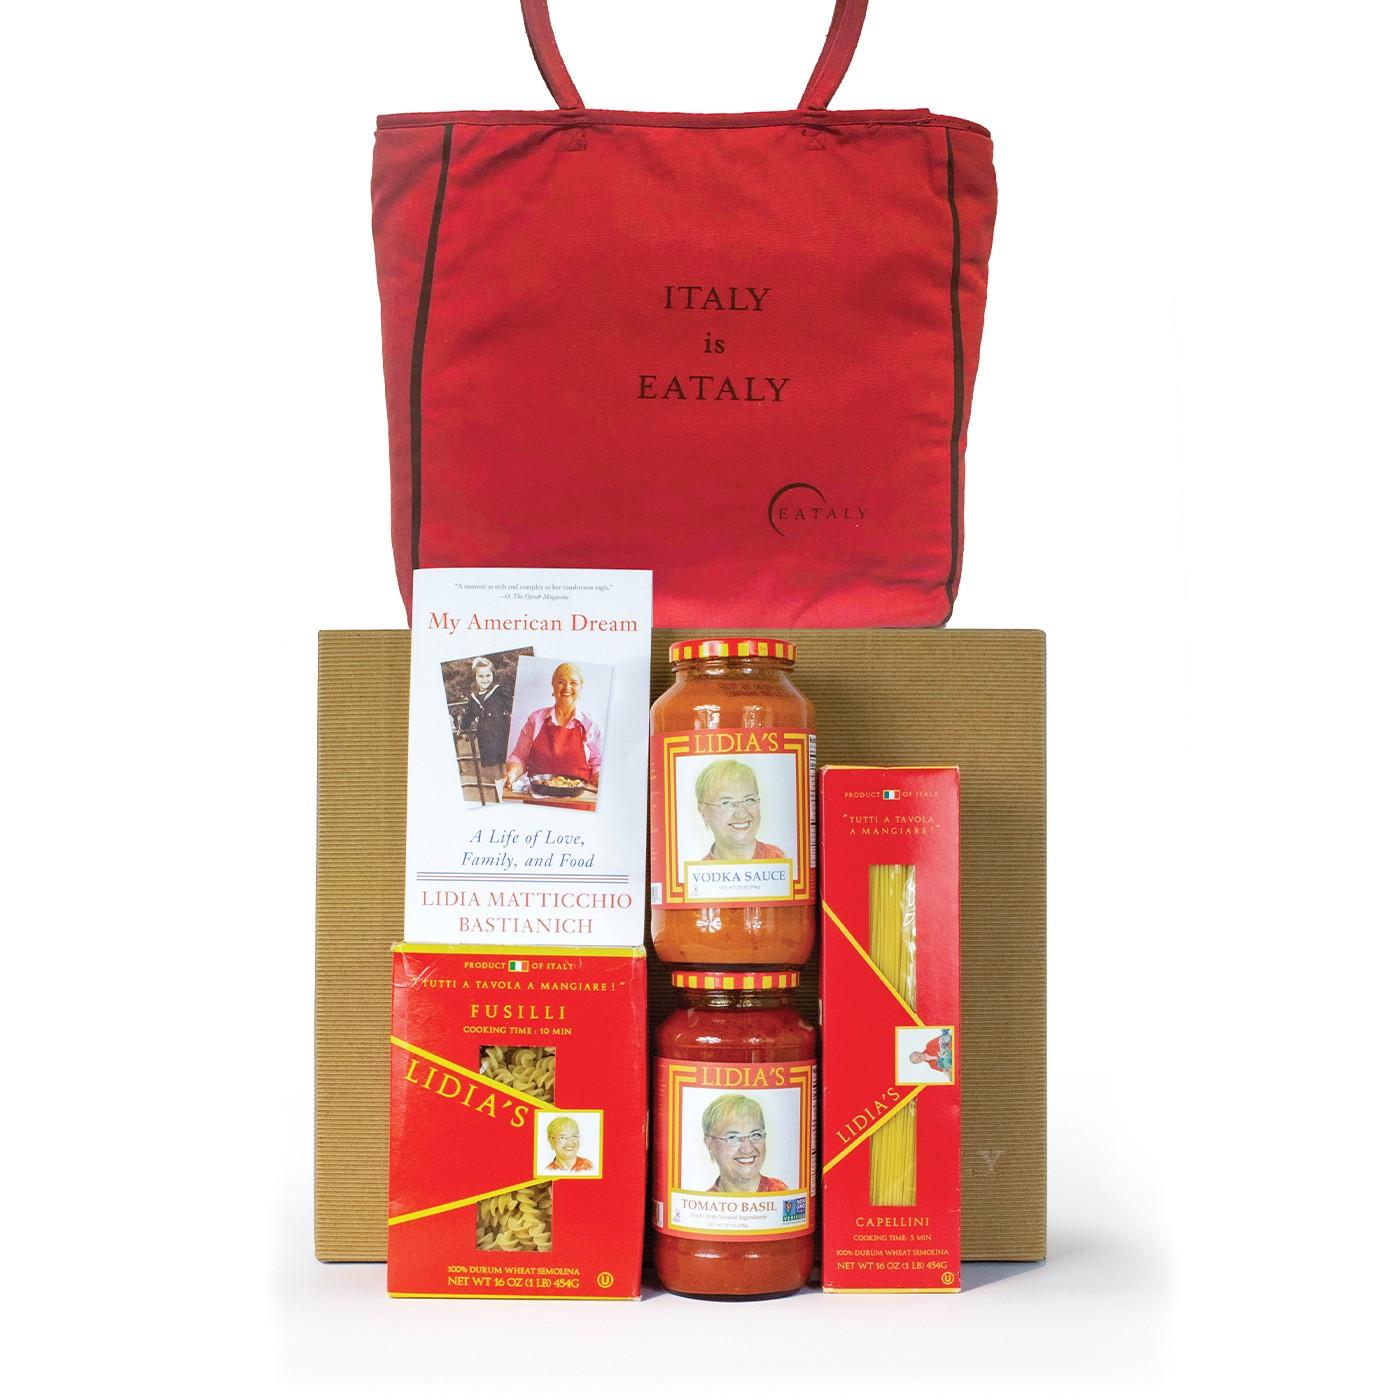 Lidia Bastianich gift basket